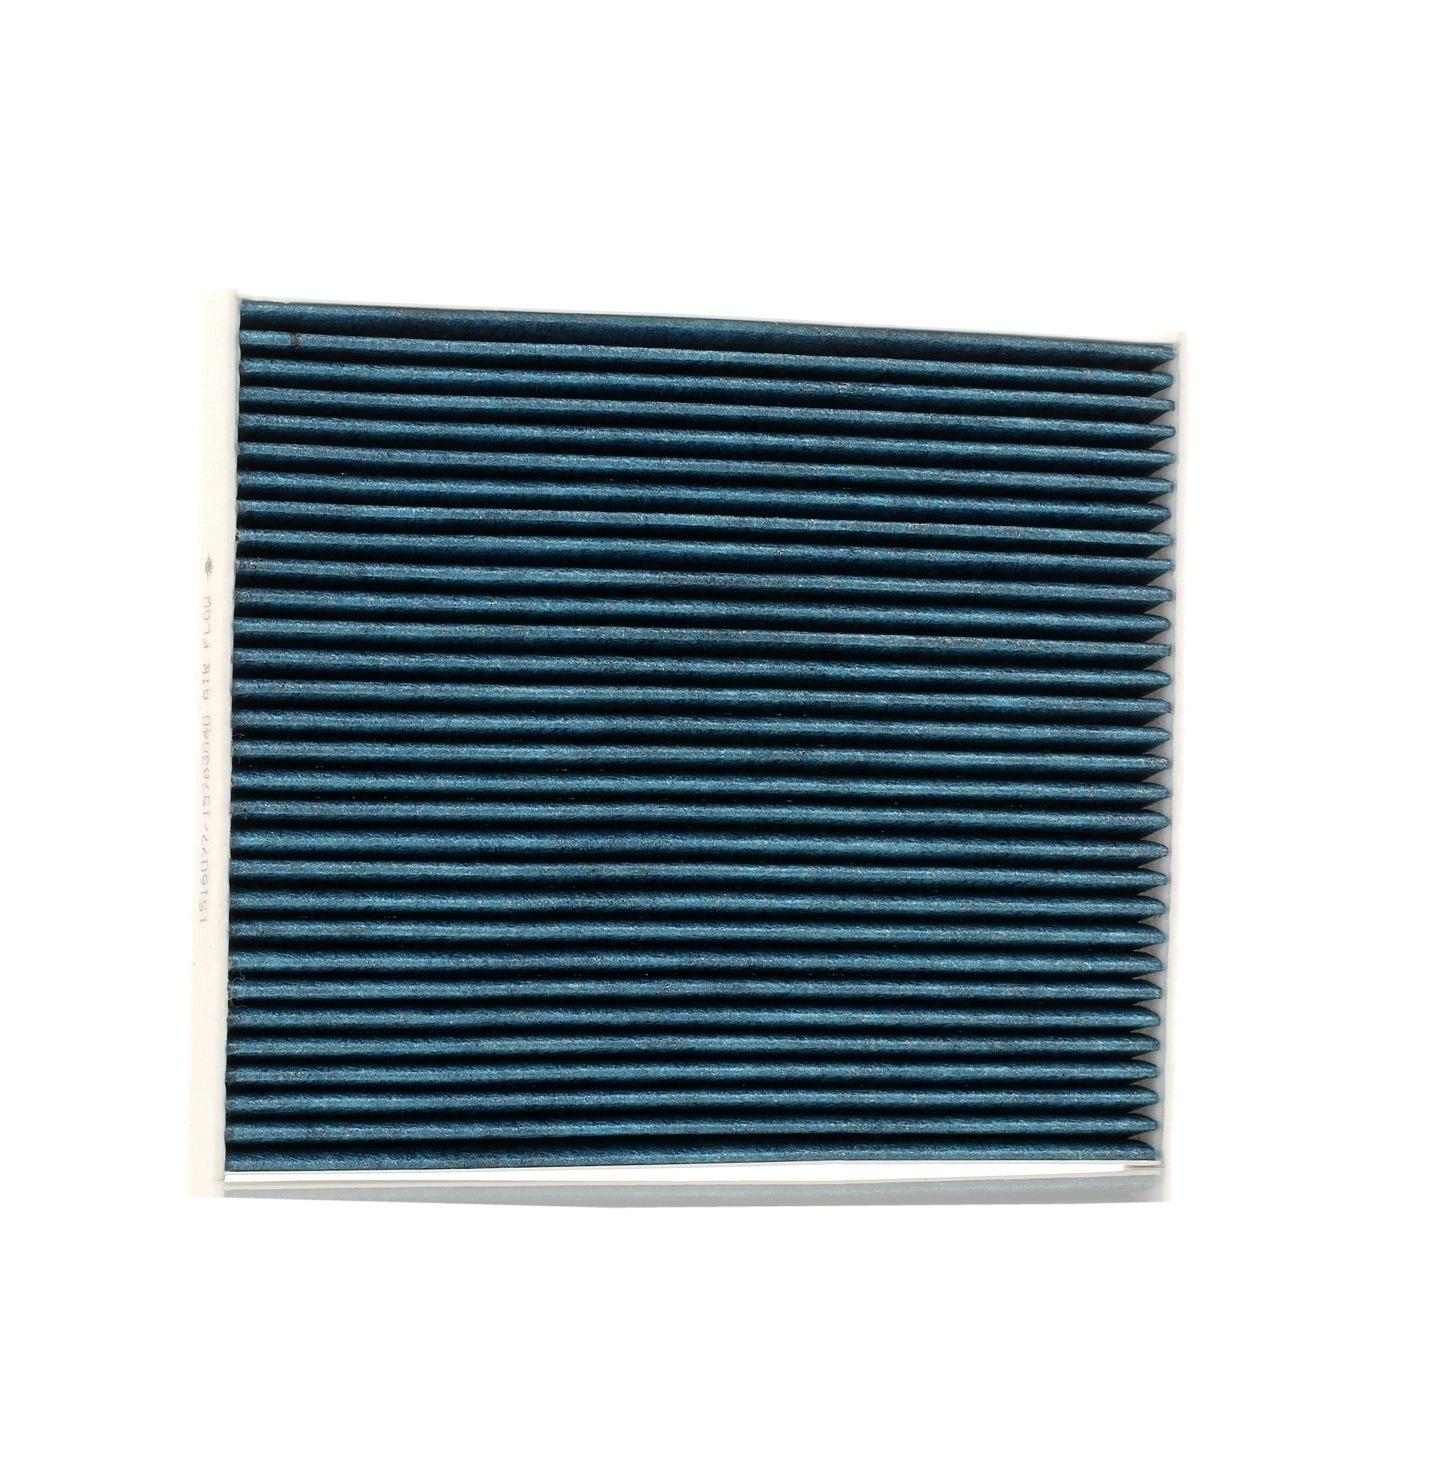 Buy original Heater RIDEX 424I0497